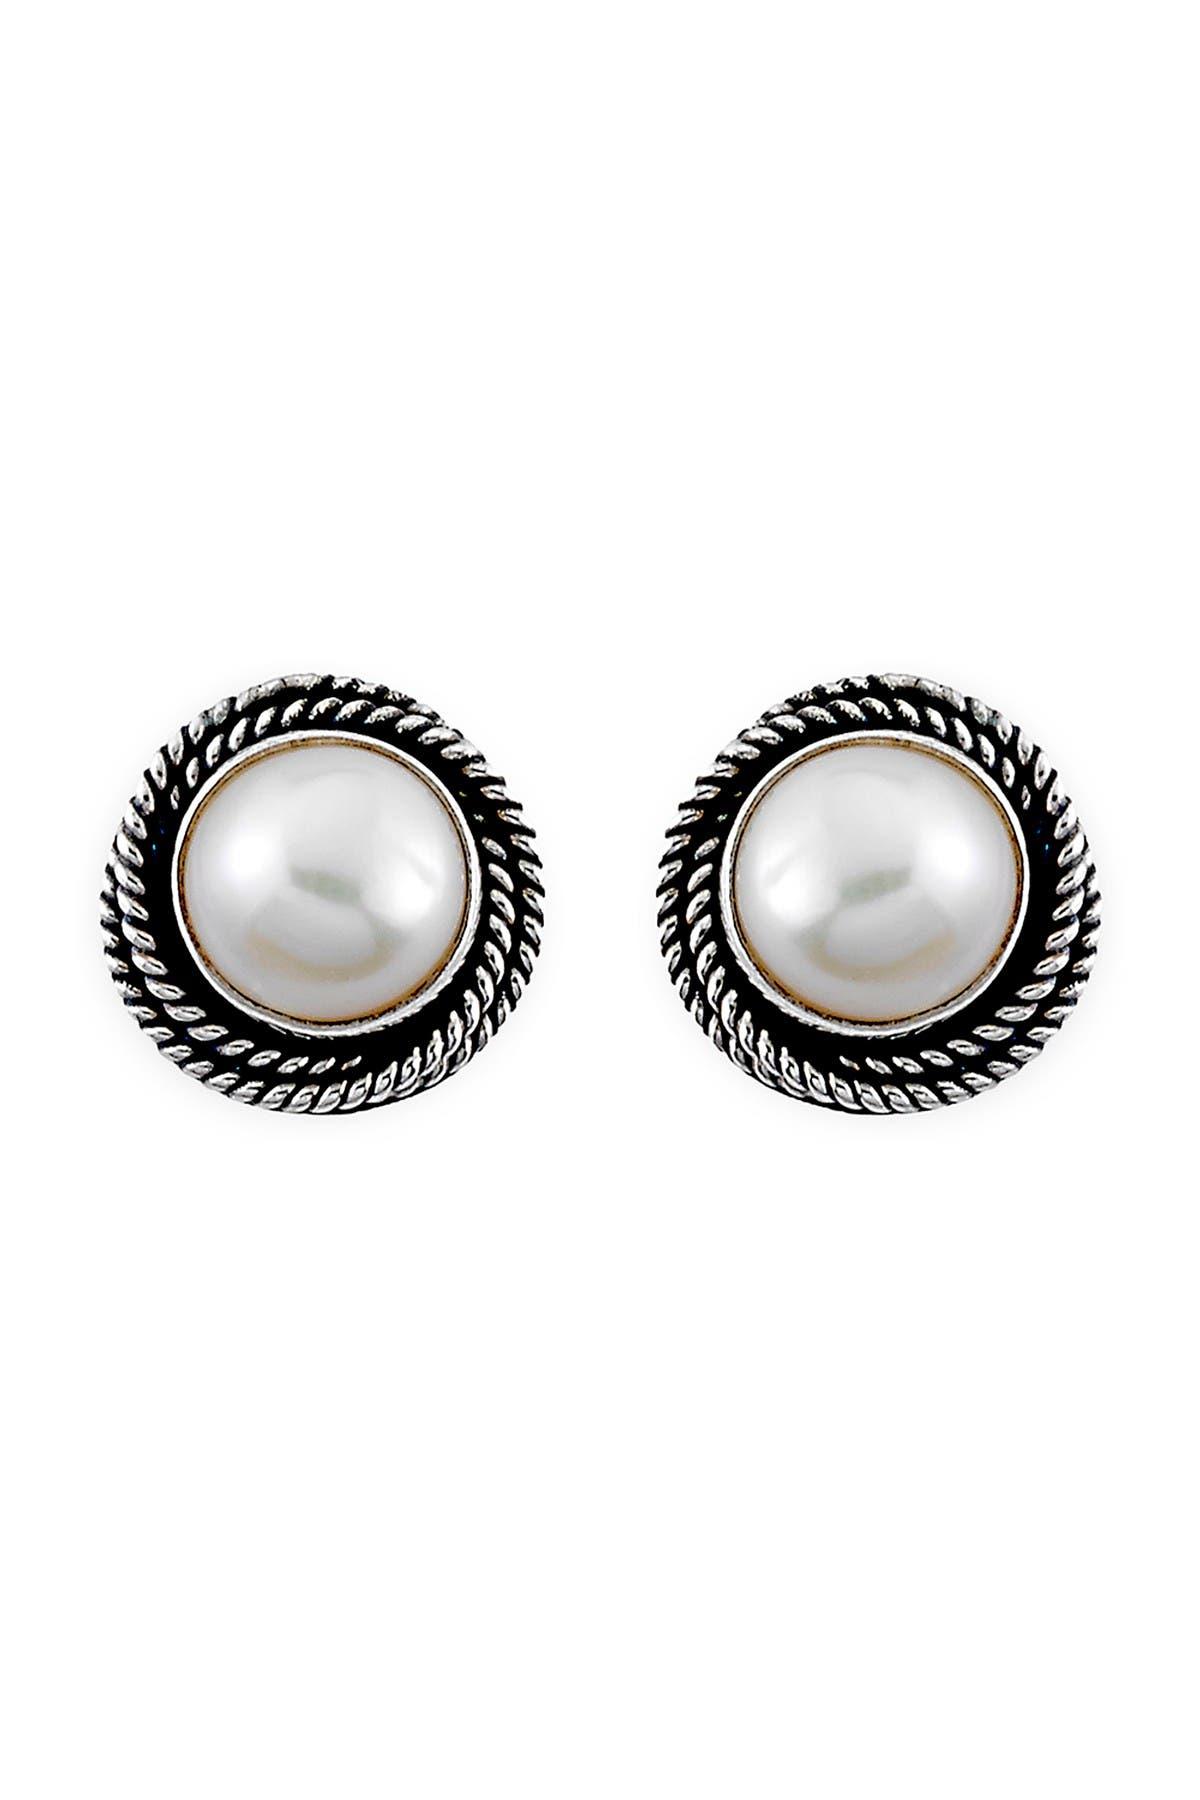 Image of Samuel B Jewelry Sterling Silver 8mm Mabe Pearl Stud Earrings